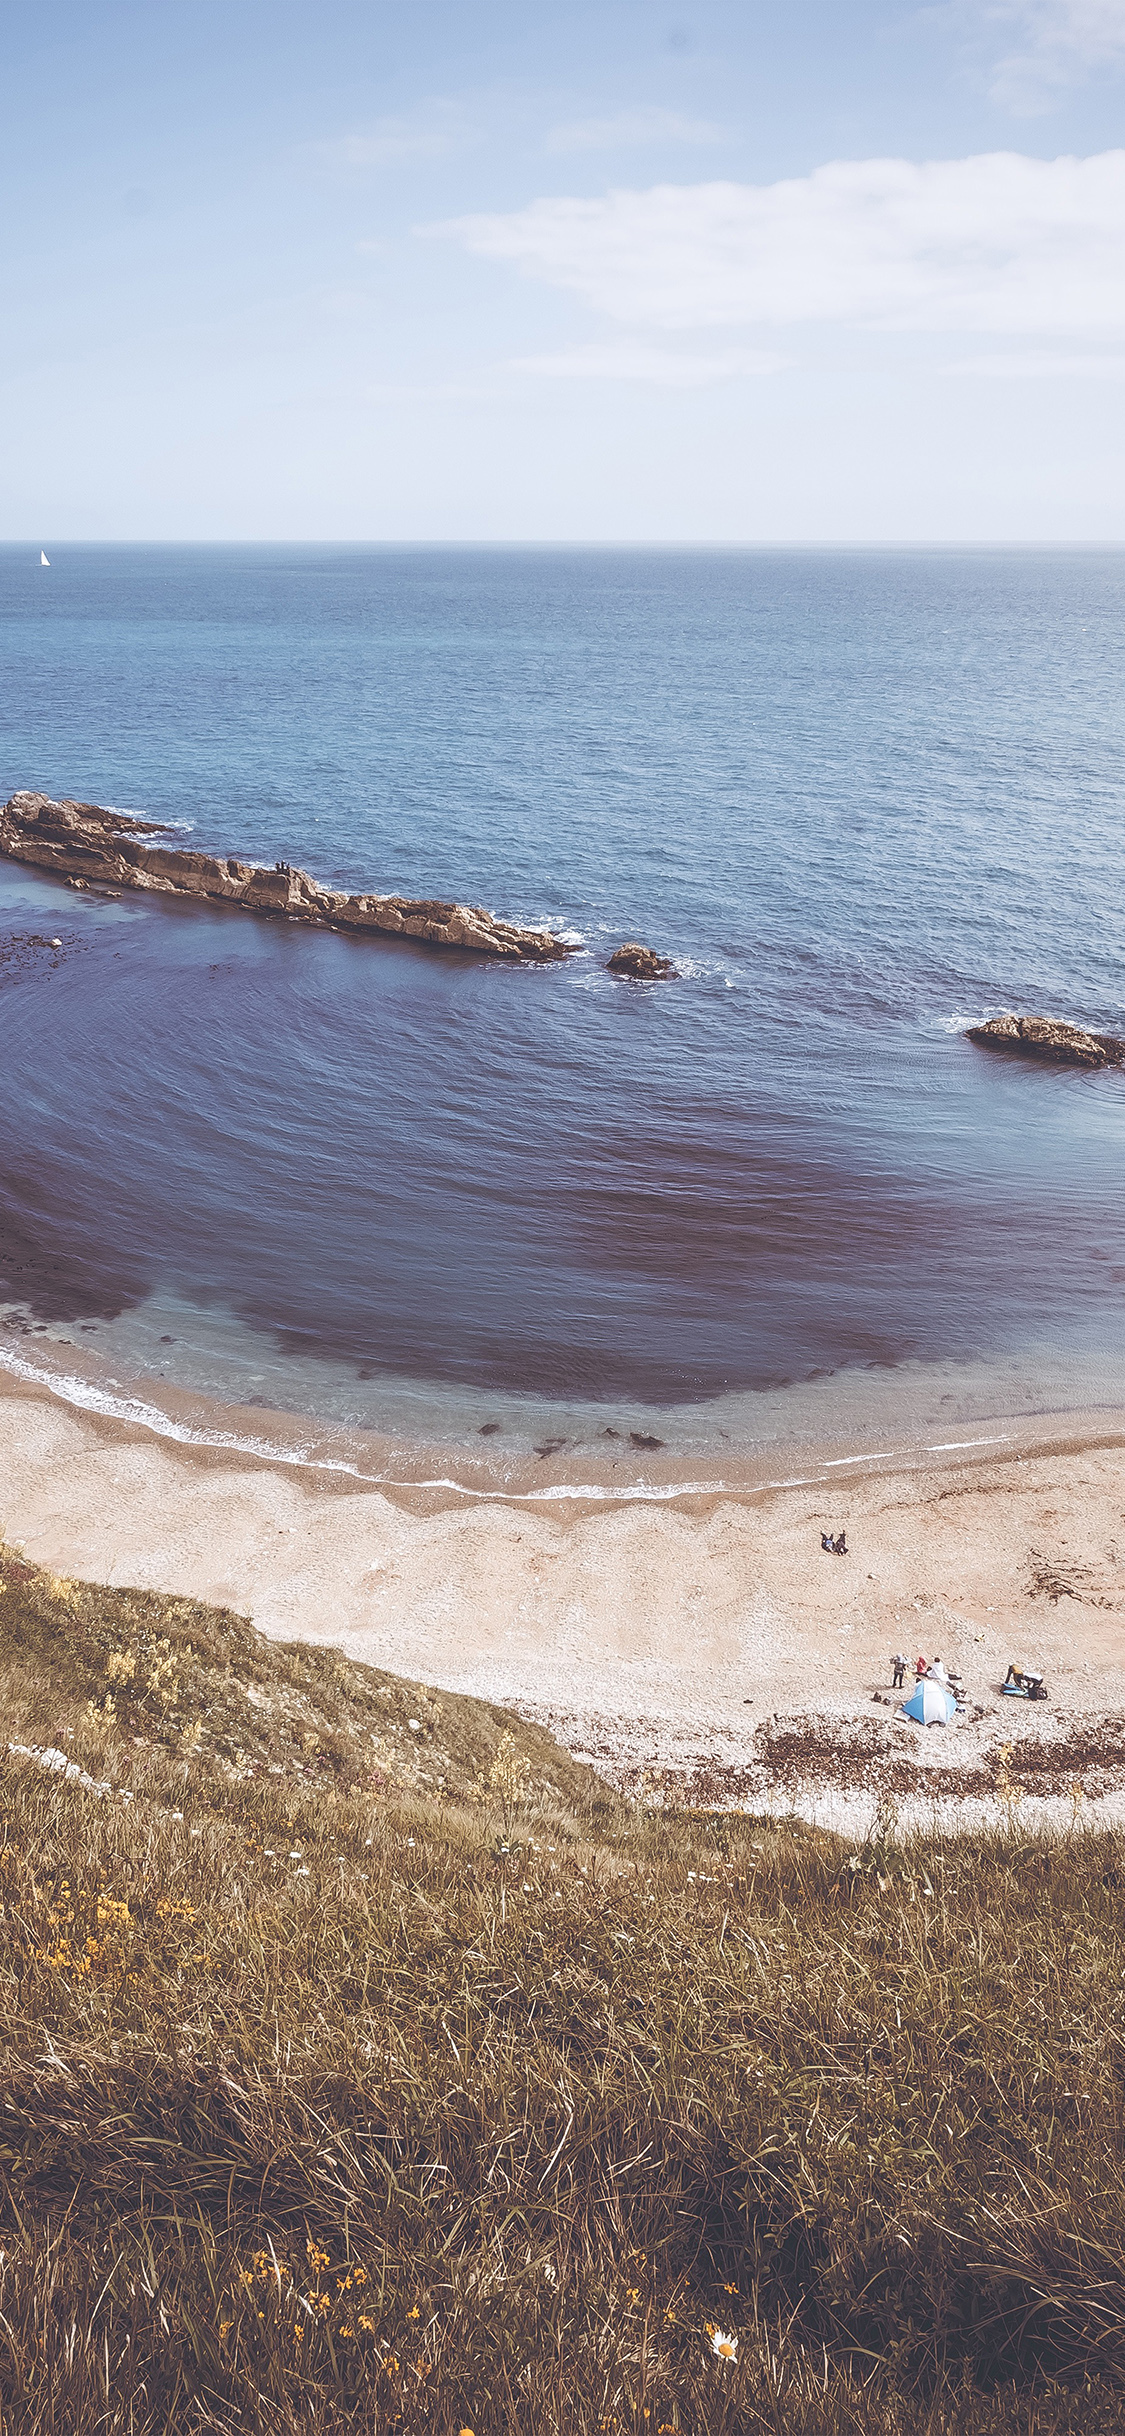 Iphonexpapers Com Iphone X Wallpaper Ng04 Nature Camping Sea Beach Ocean Rock Mountain